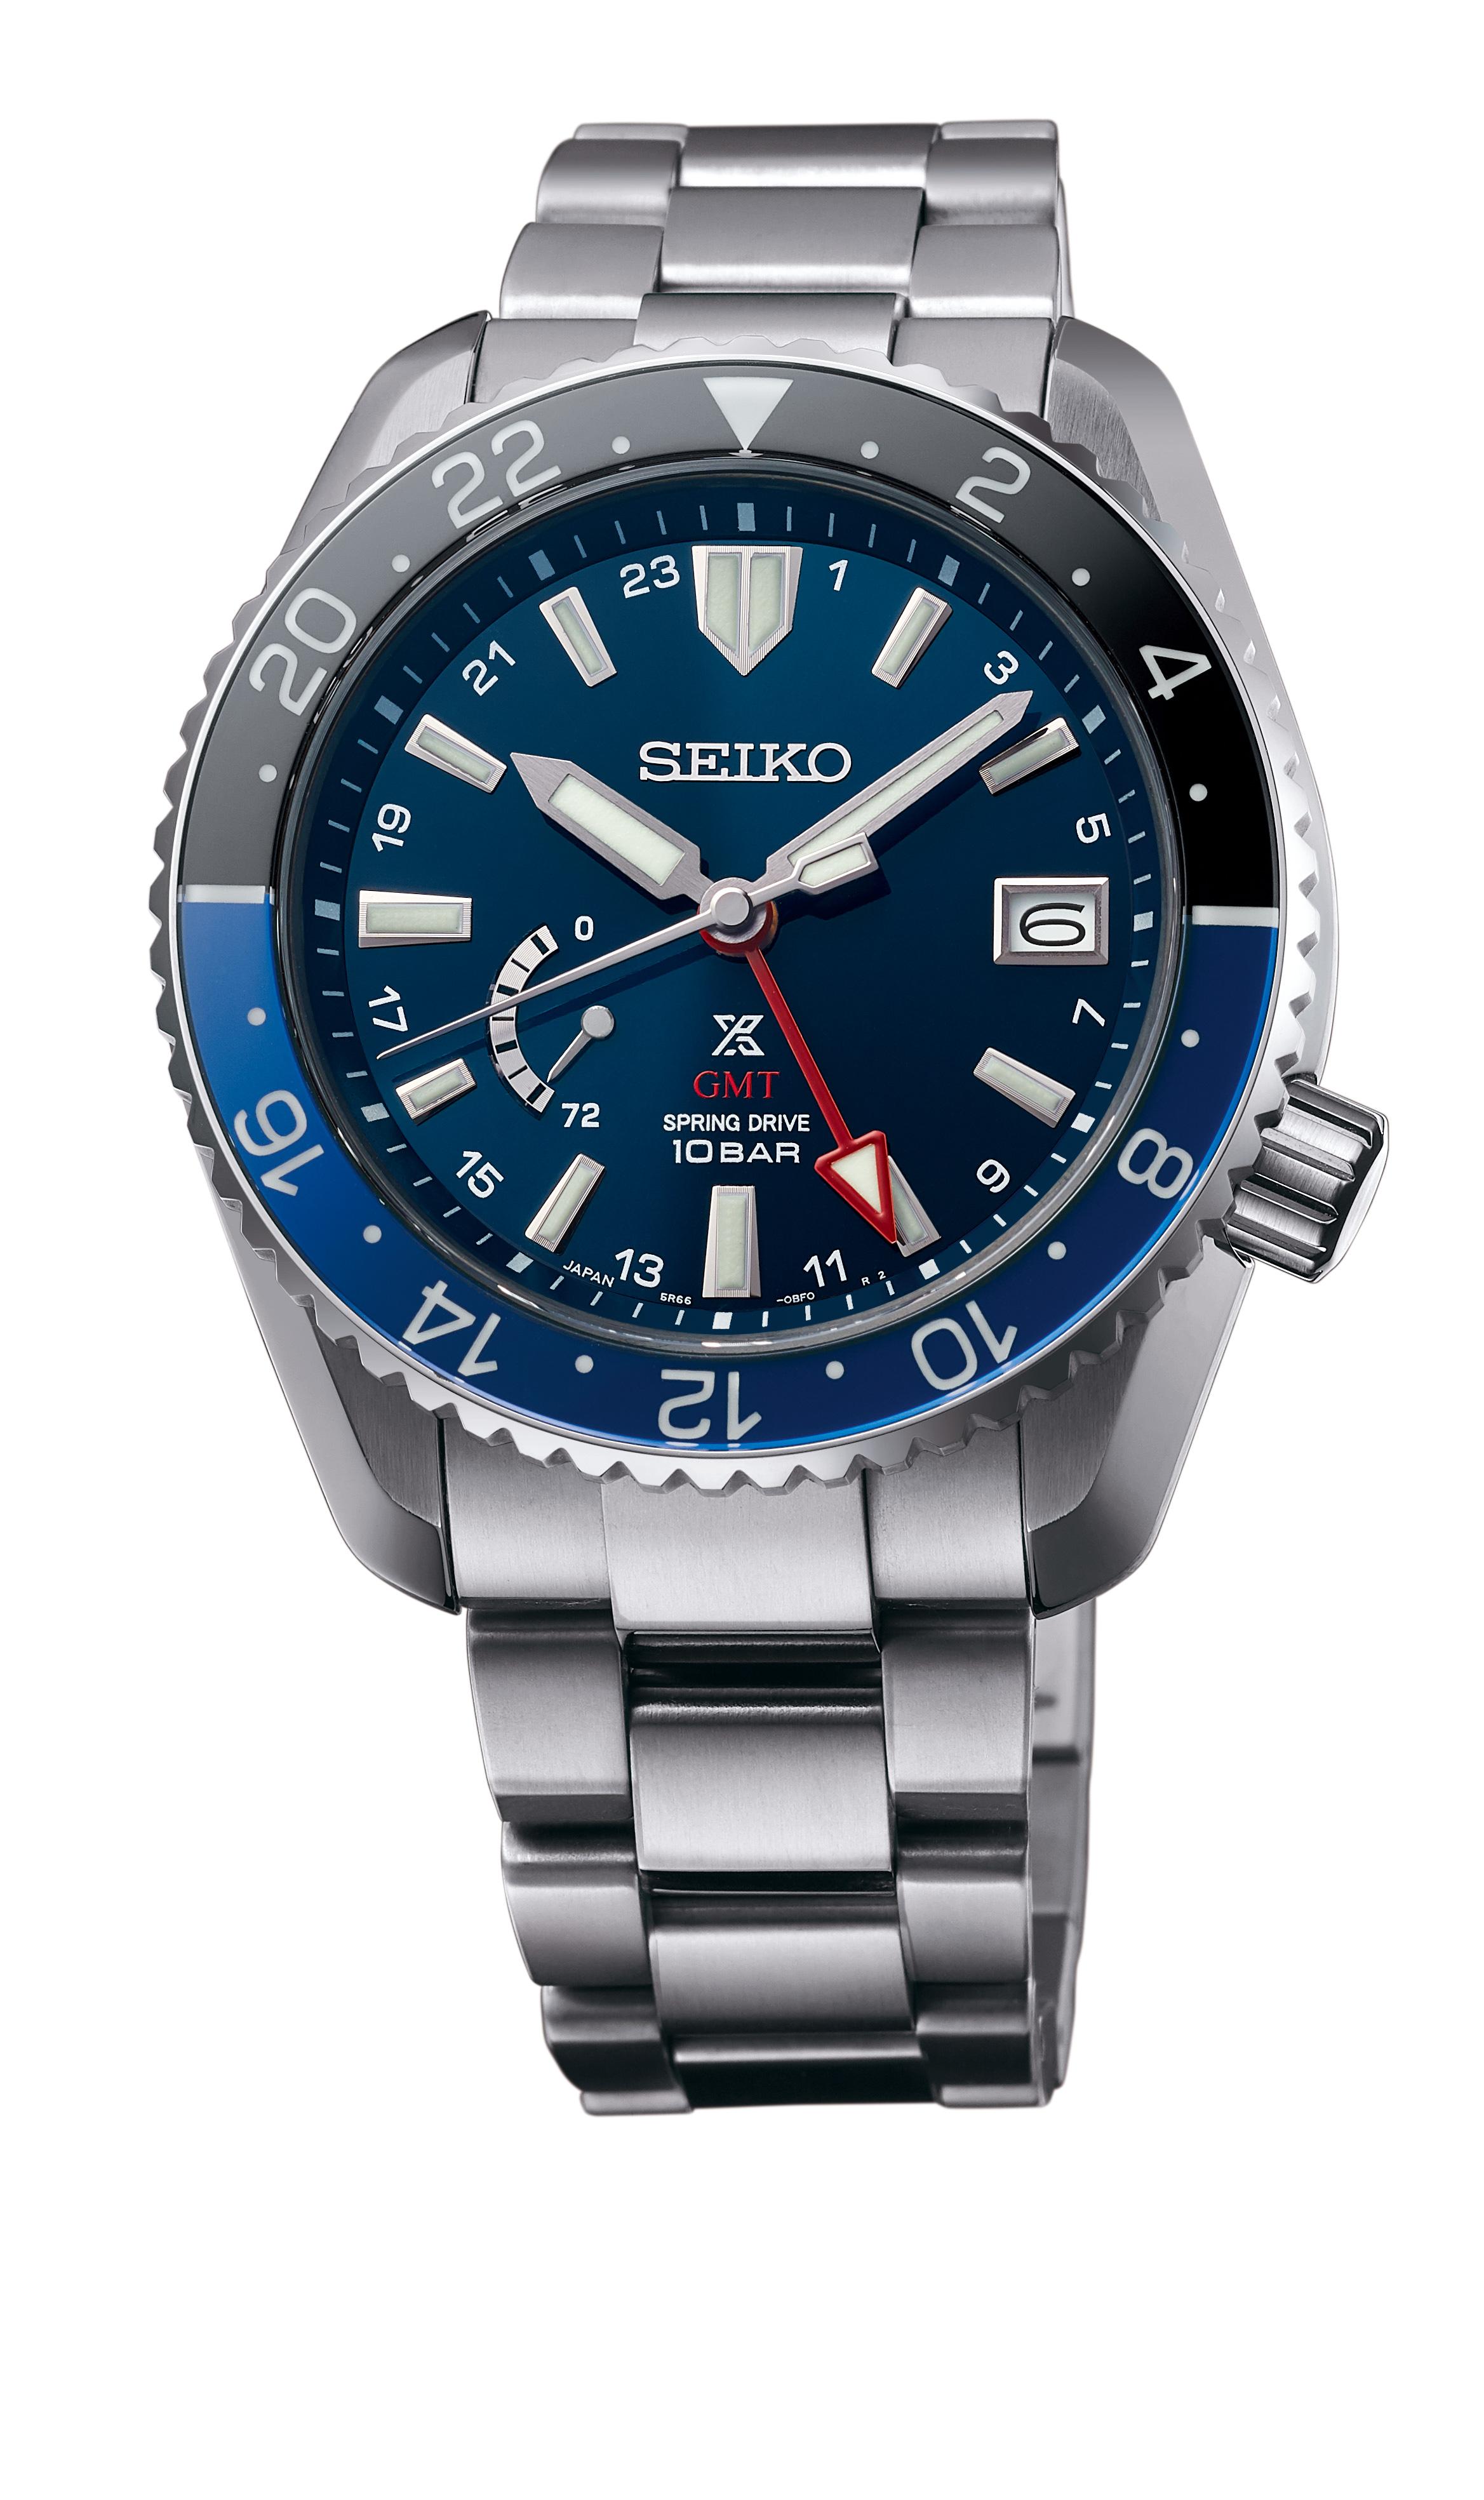 Die Armbanduhr von Seiko Prospex LX